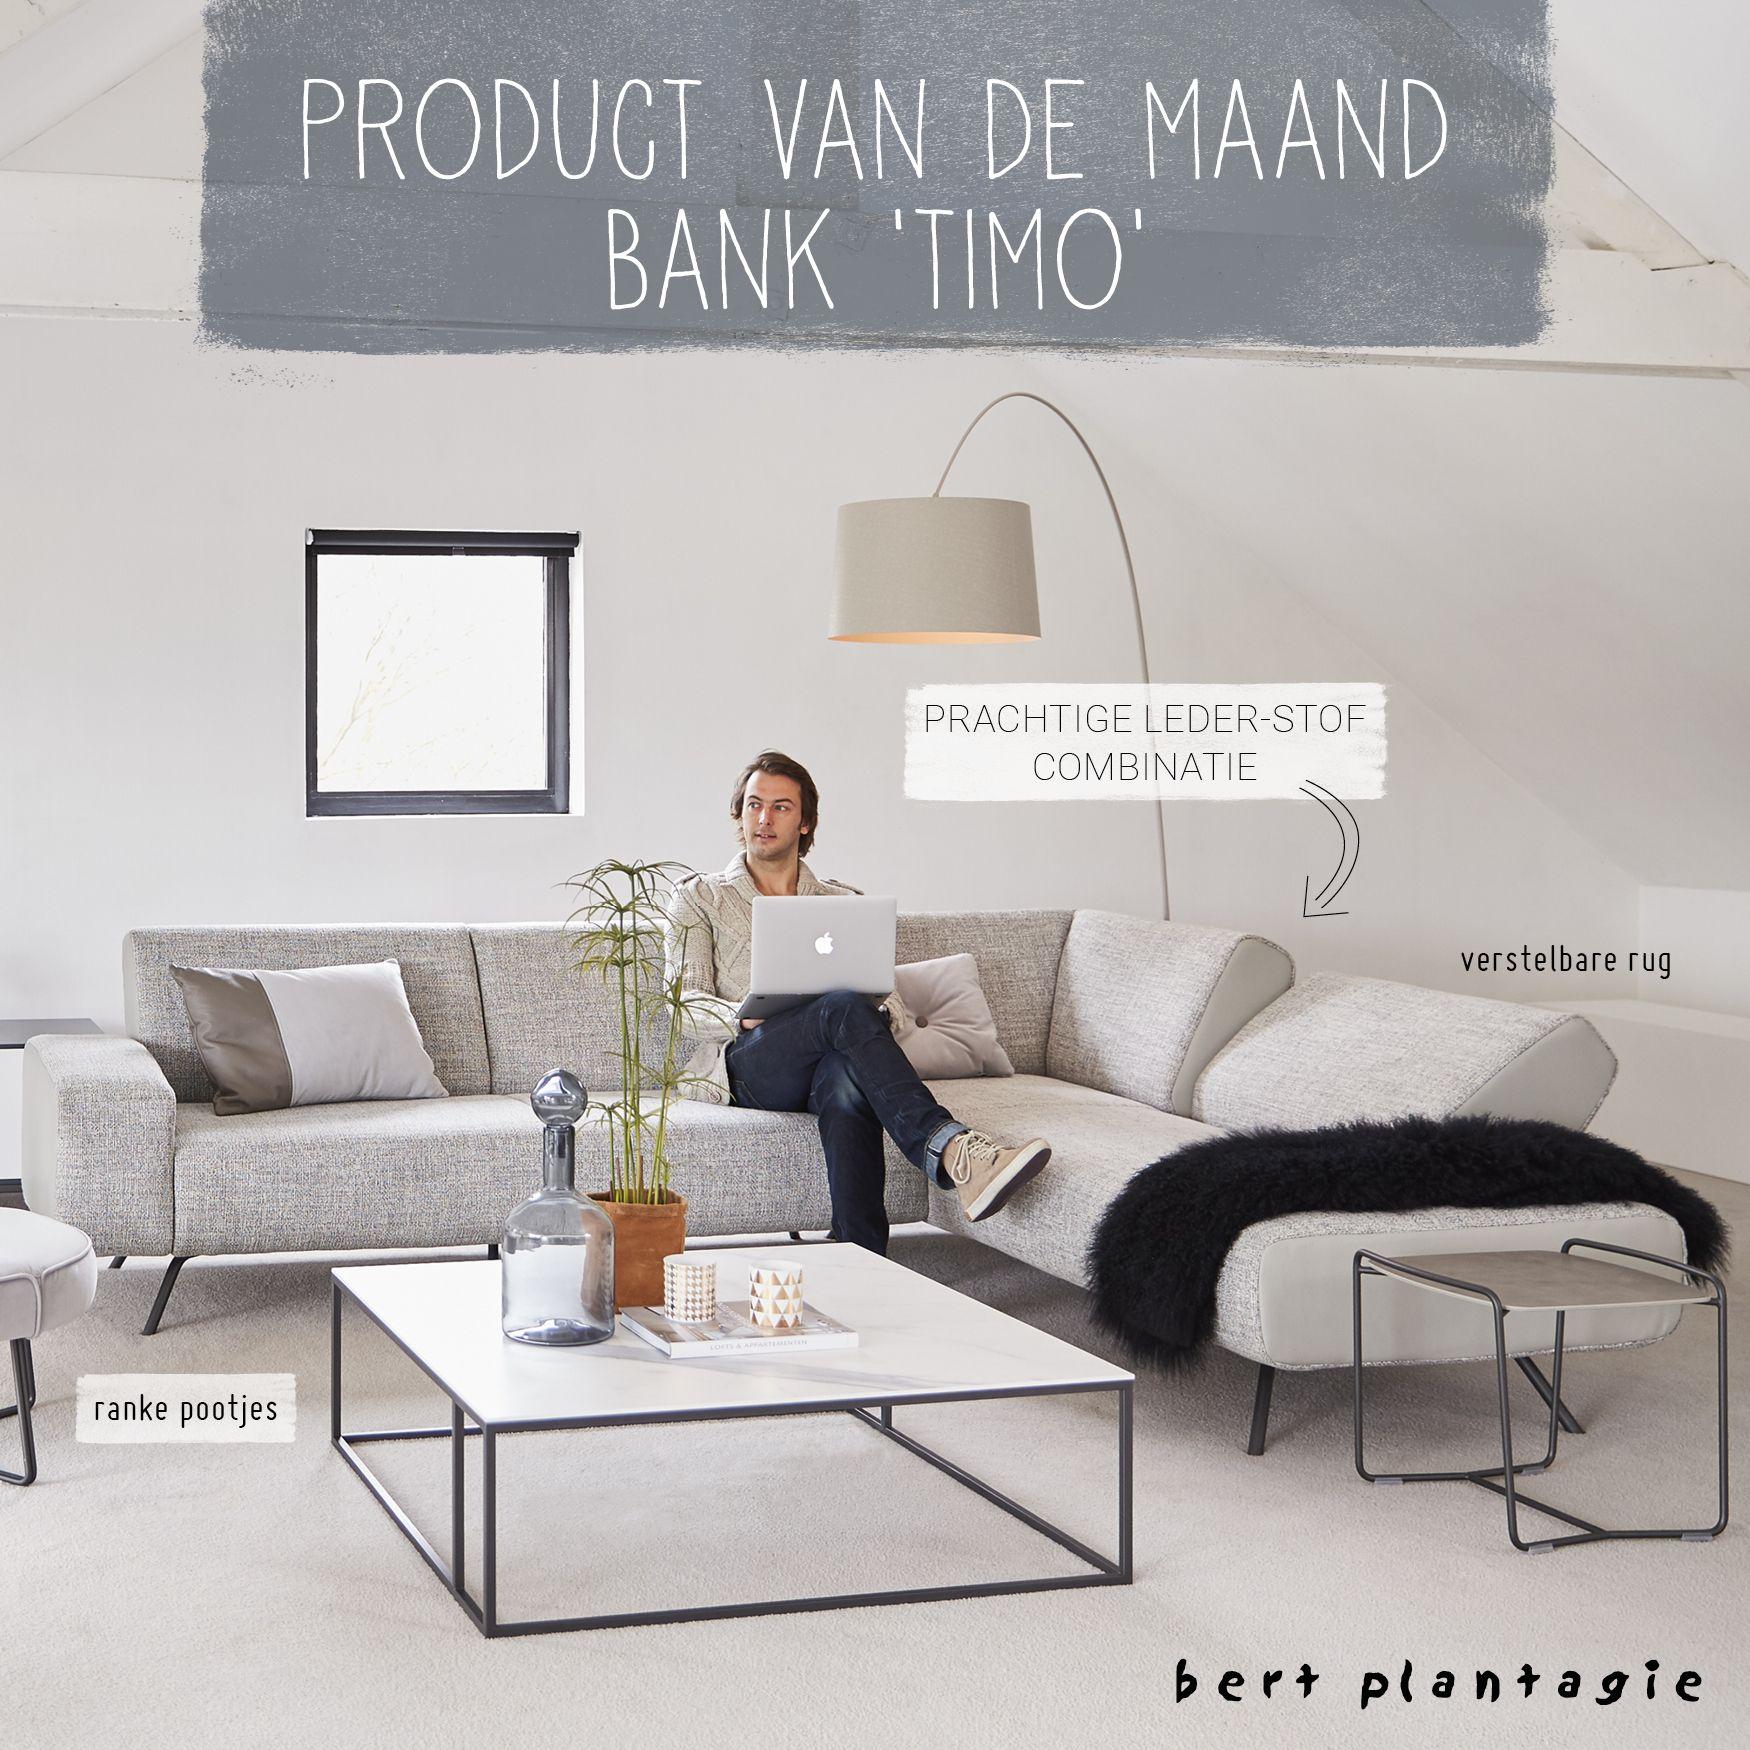 bert plantagie timo bank sofa dutchdesign wooninspiratie inspiration - Banksofa